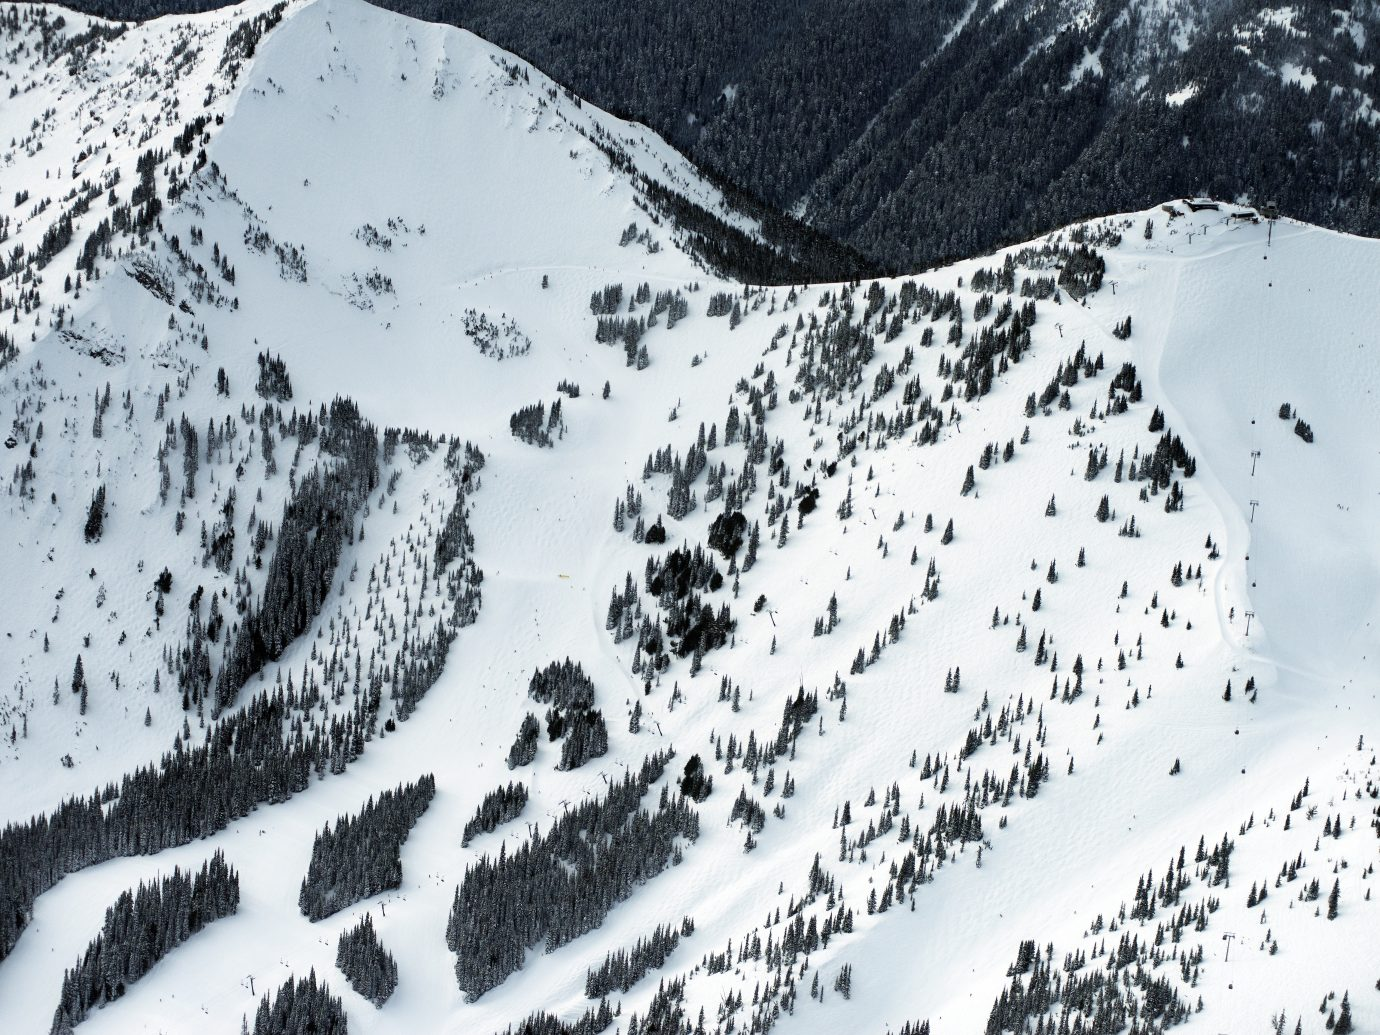 Aerial shot at Crystal Mountain, Pierce, WA